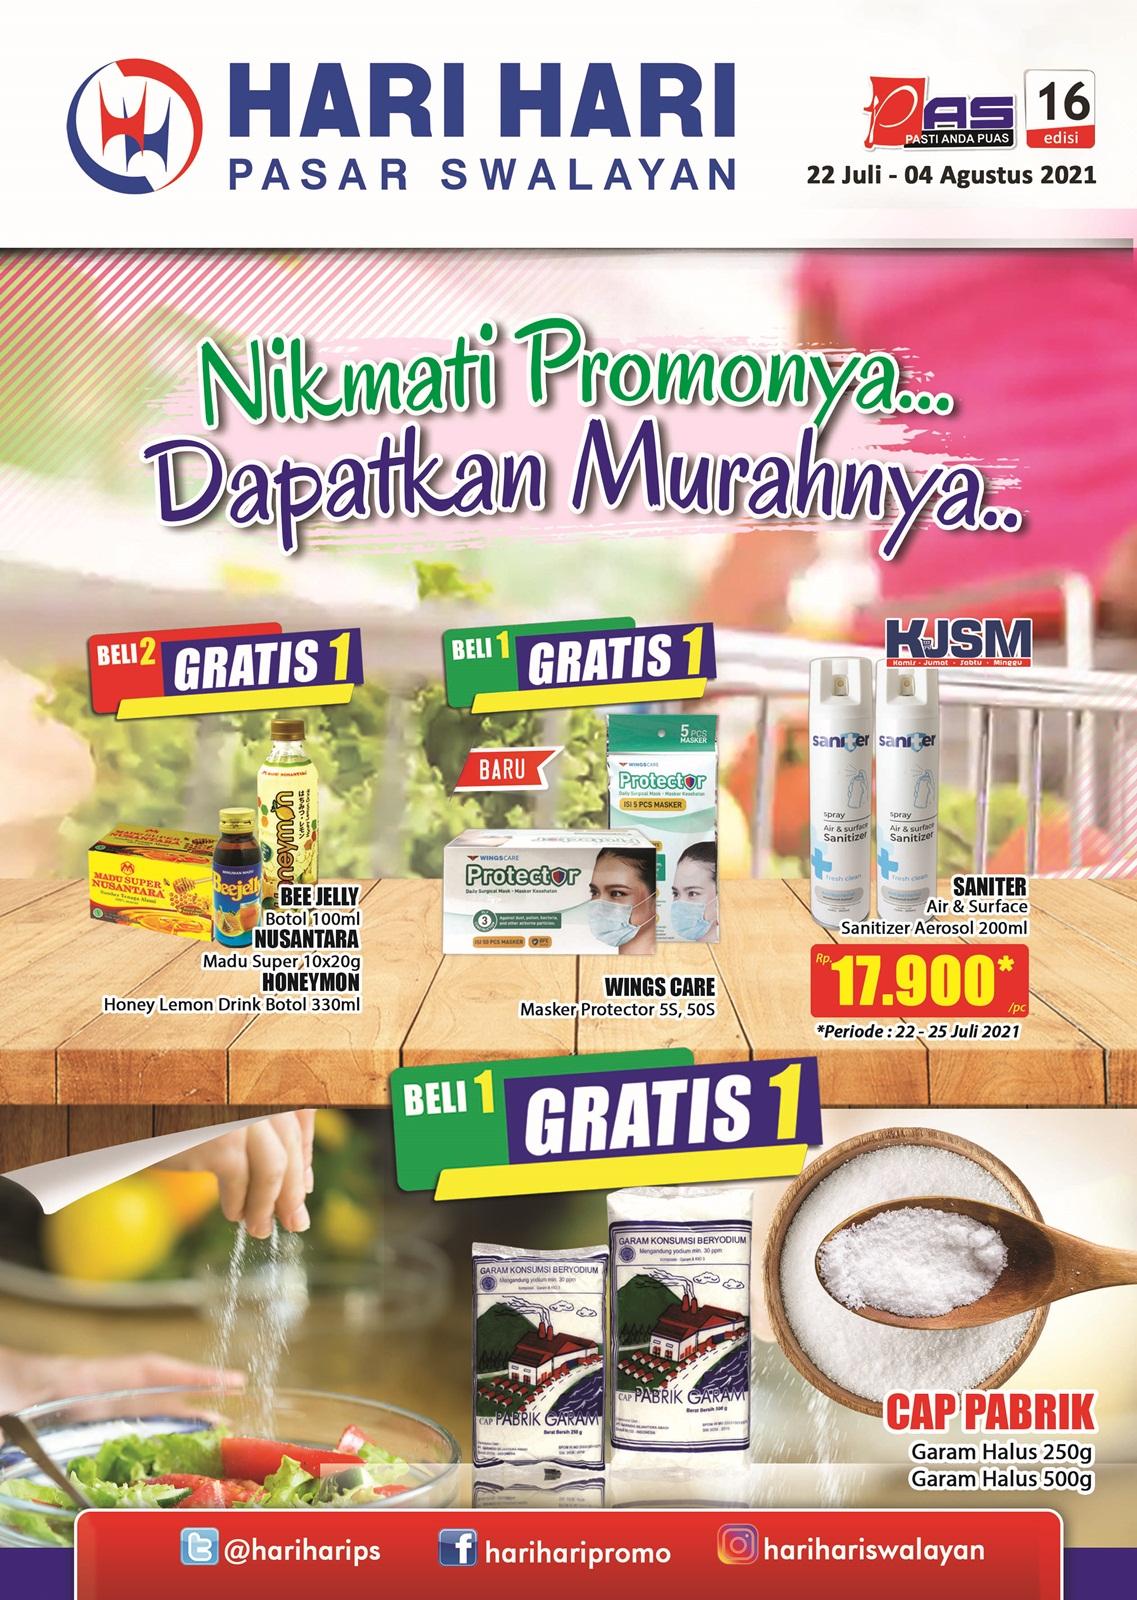 Promo Hari Hari Pasar Swalayan Katalog Mingguan Periode 22 Juli - 04 Agustus 2021